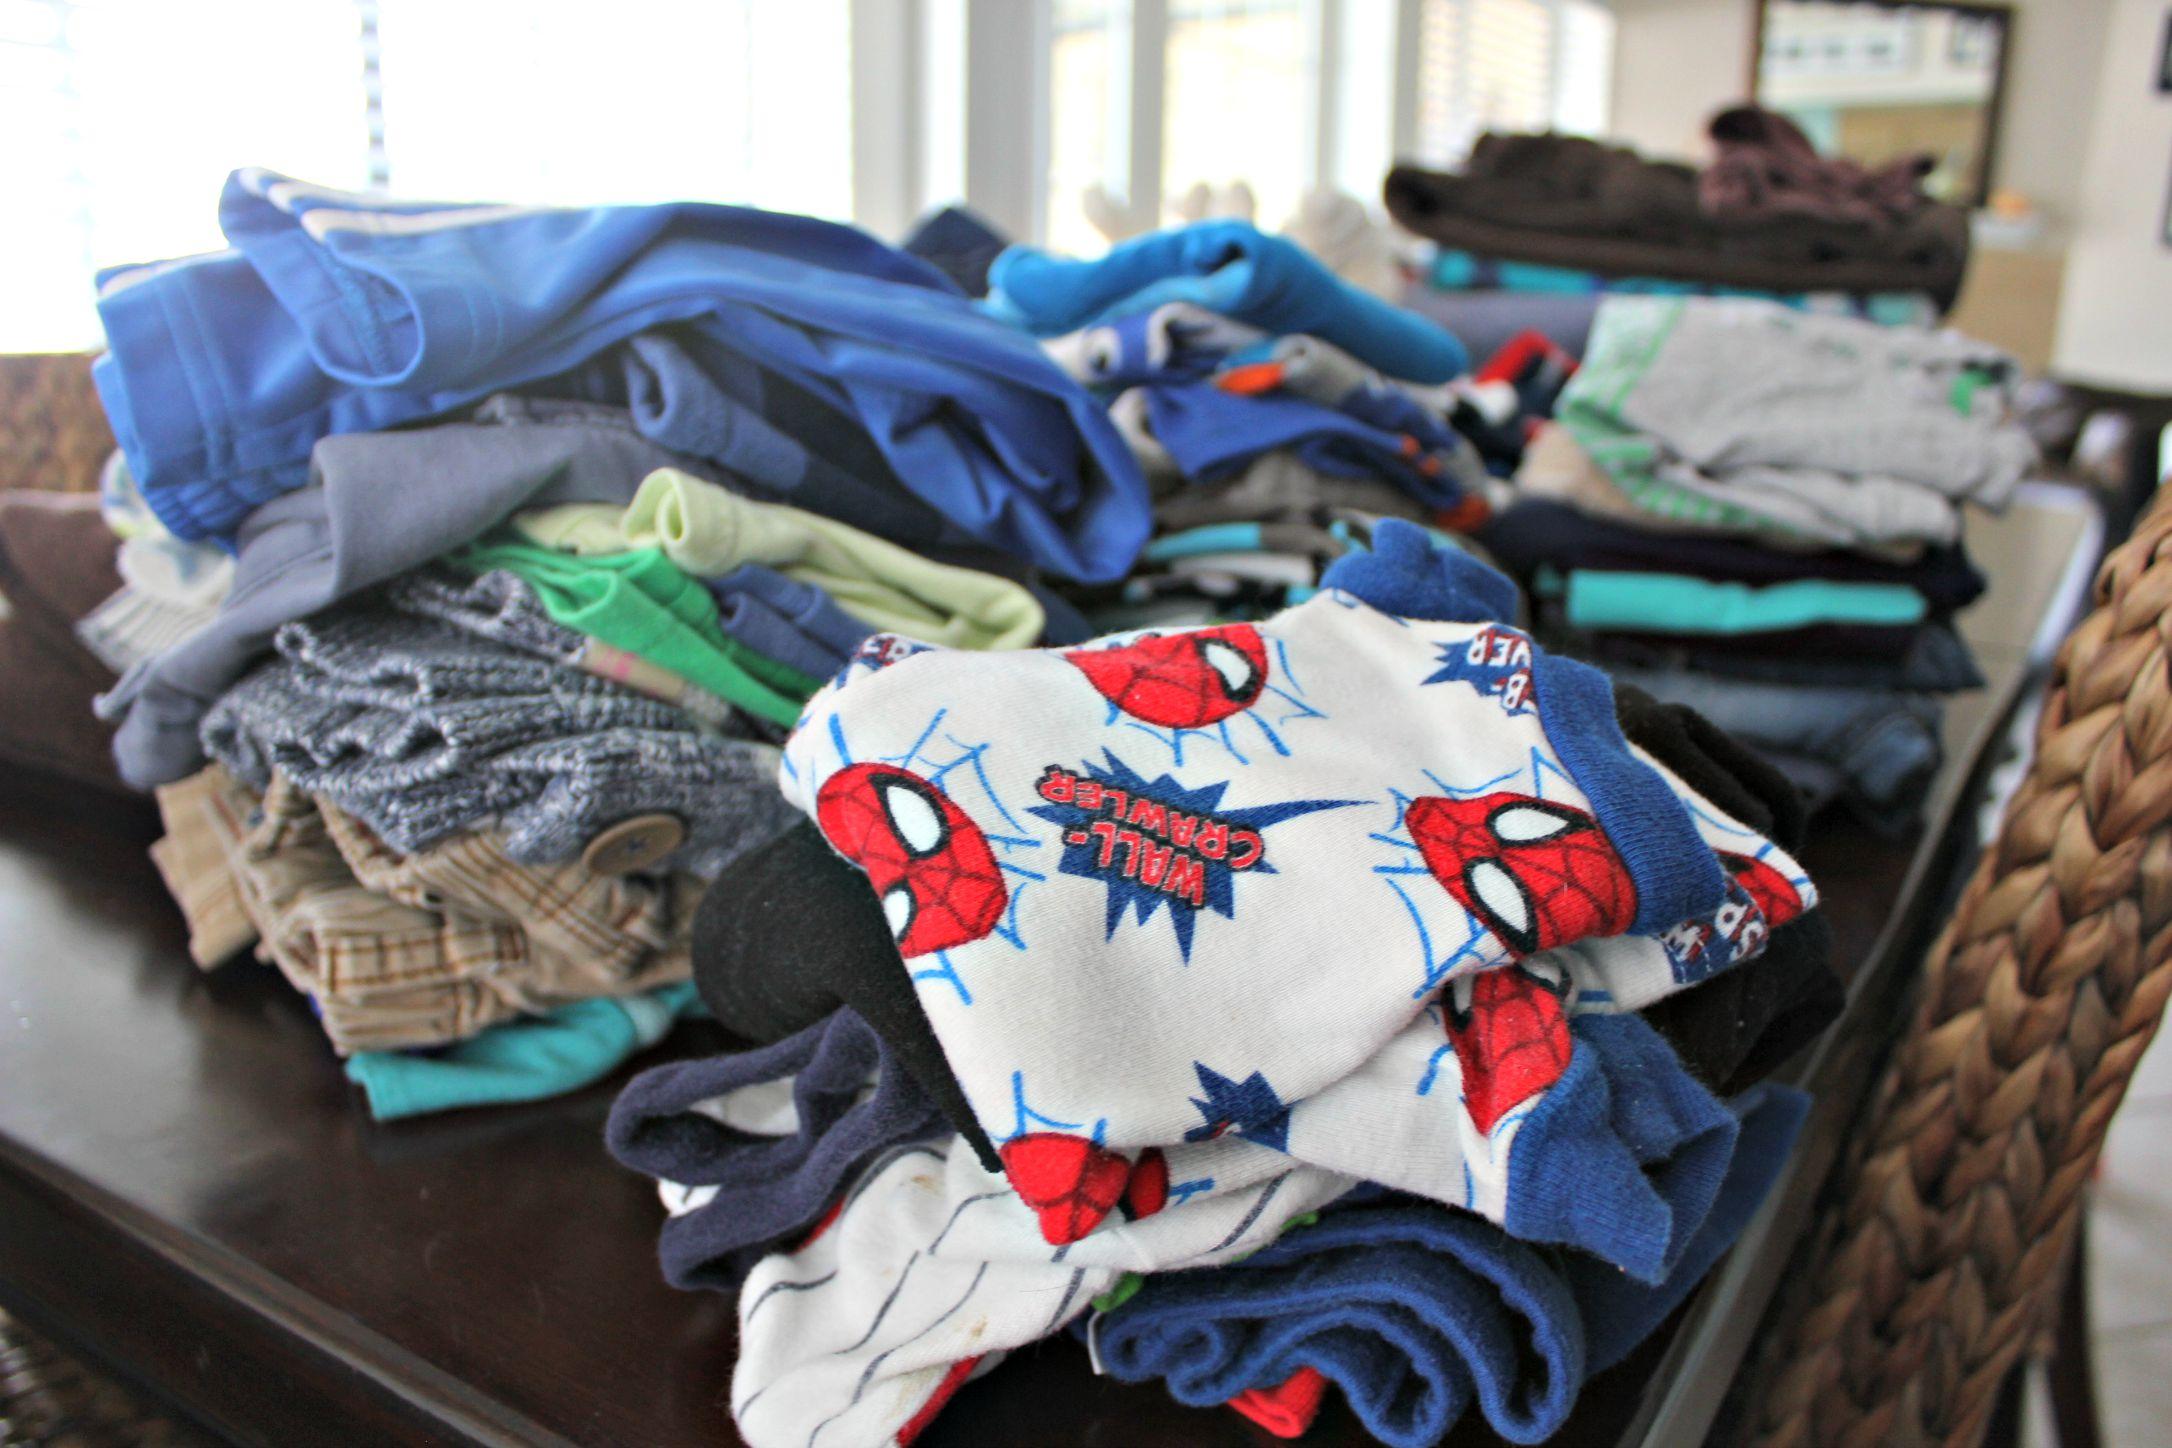 15 Reasons I Hate Folding Laundry SheJustGlows.com